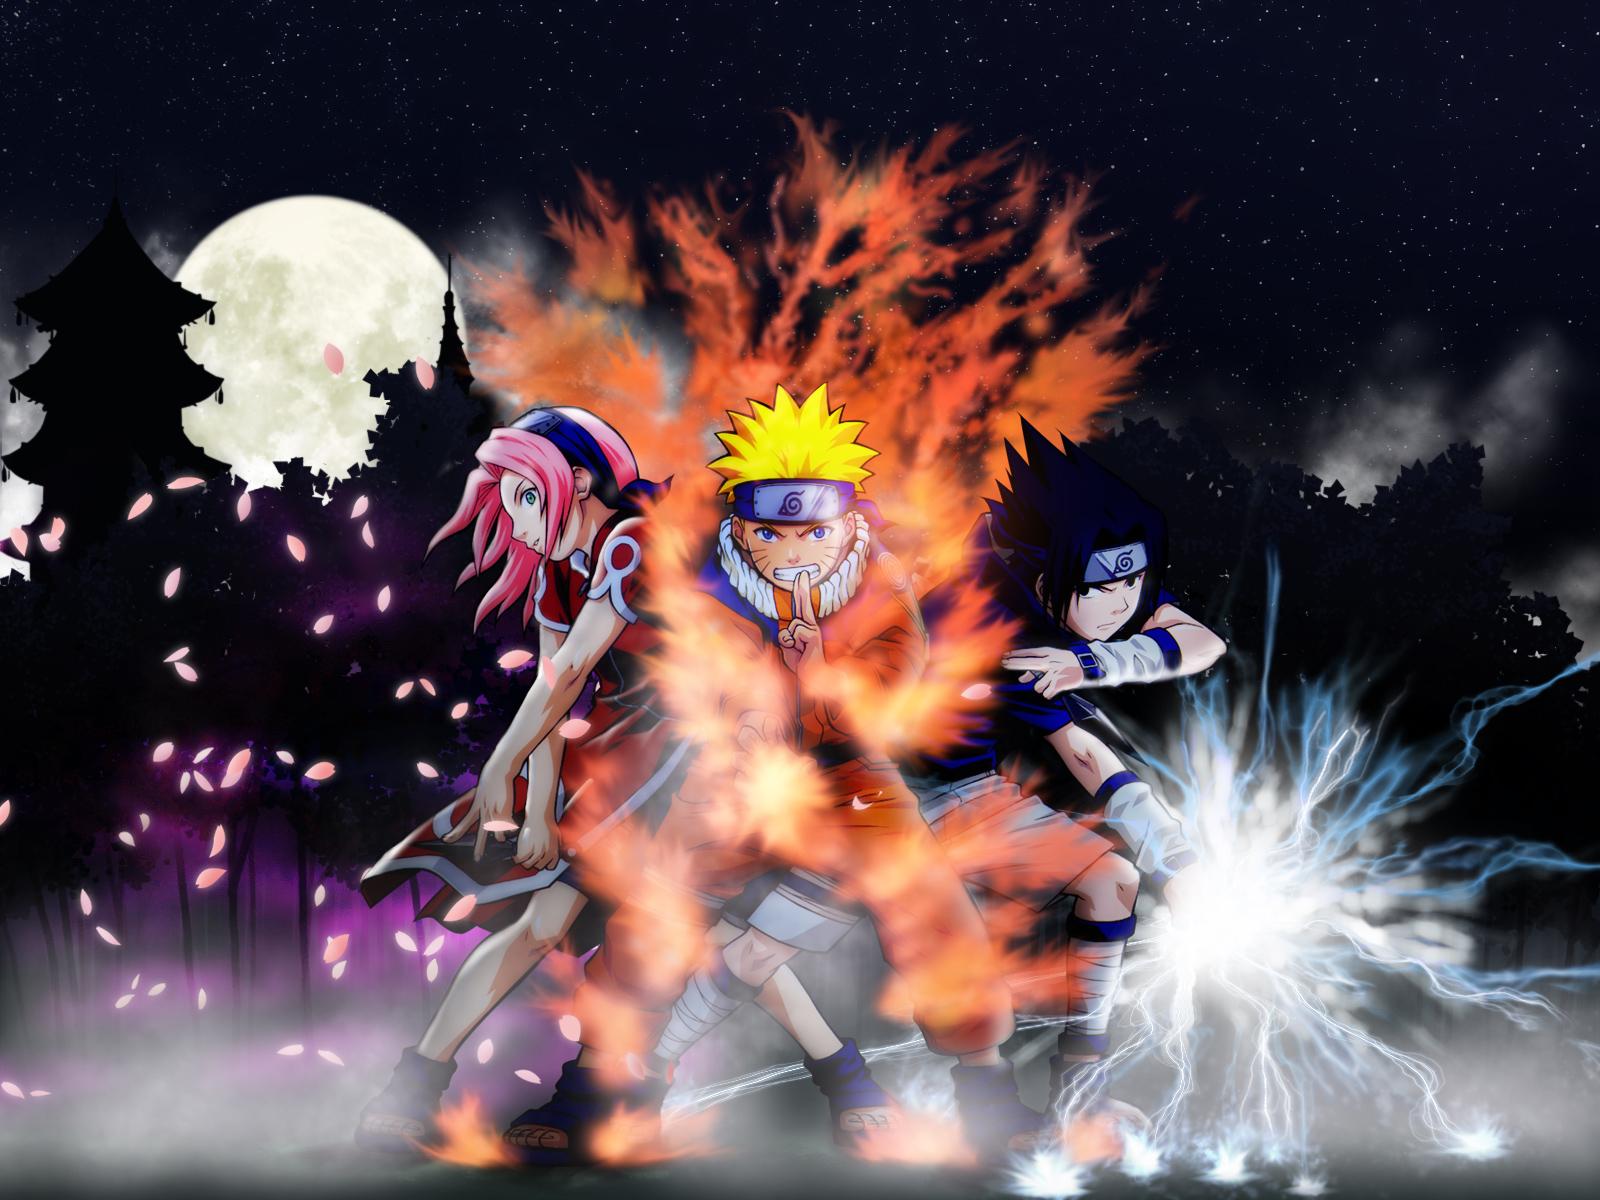 Zeir world naruto wallpaper it 39 s cool - Portrait anime wallpaper ...